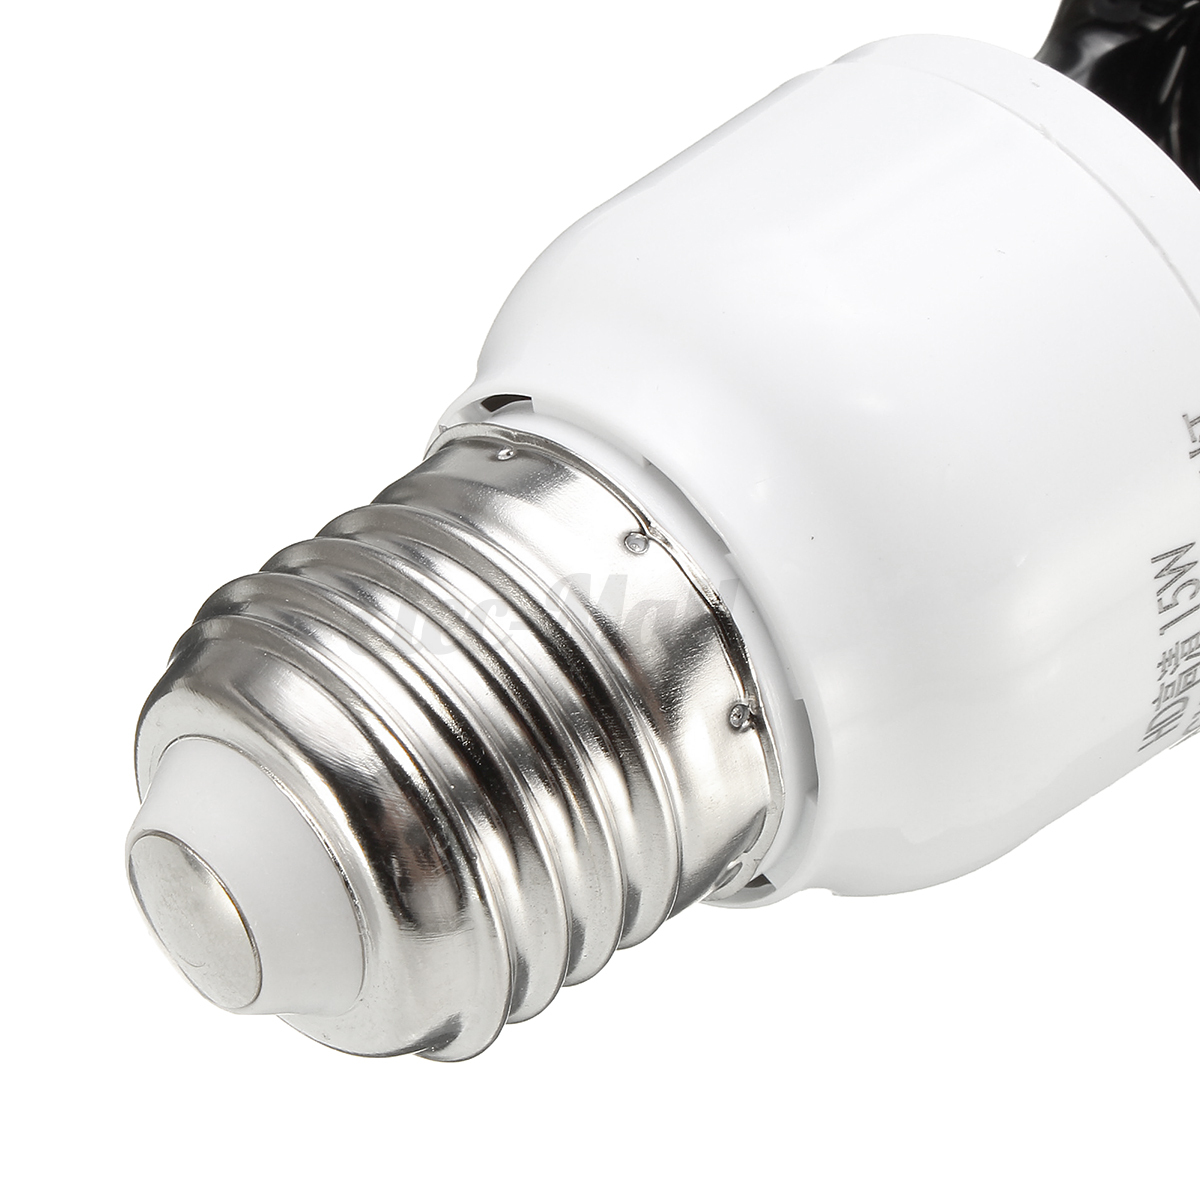 Replacement UV Light Bulbs Lamp 15W/40W Watt Base For